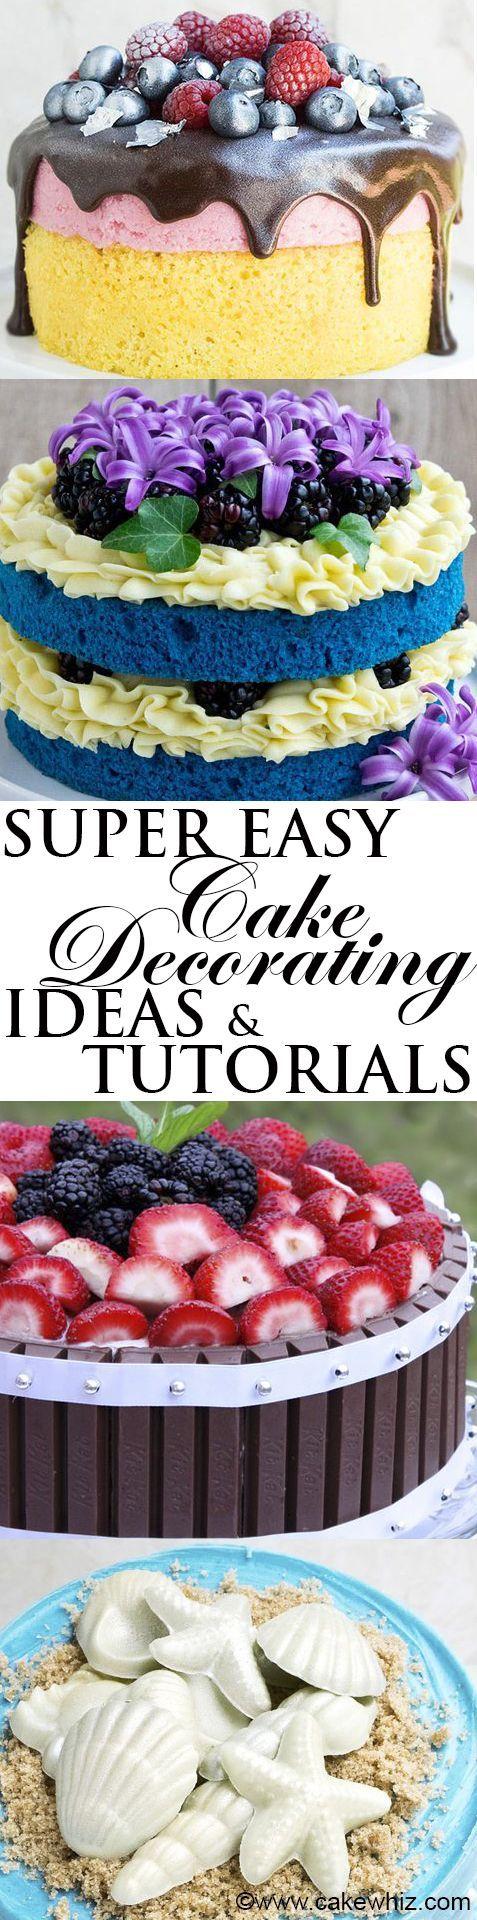 Best 25 Beginner cake decorating ideas on Pinterest Icing tips